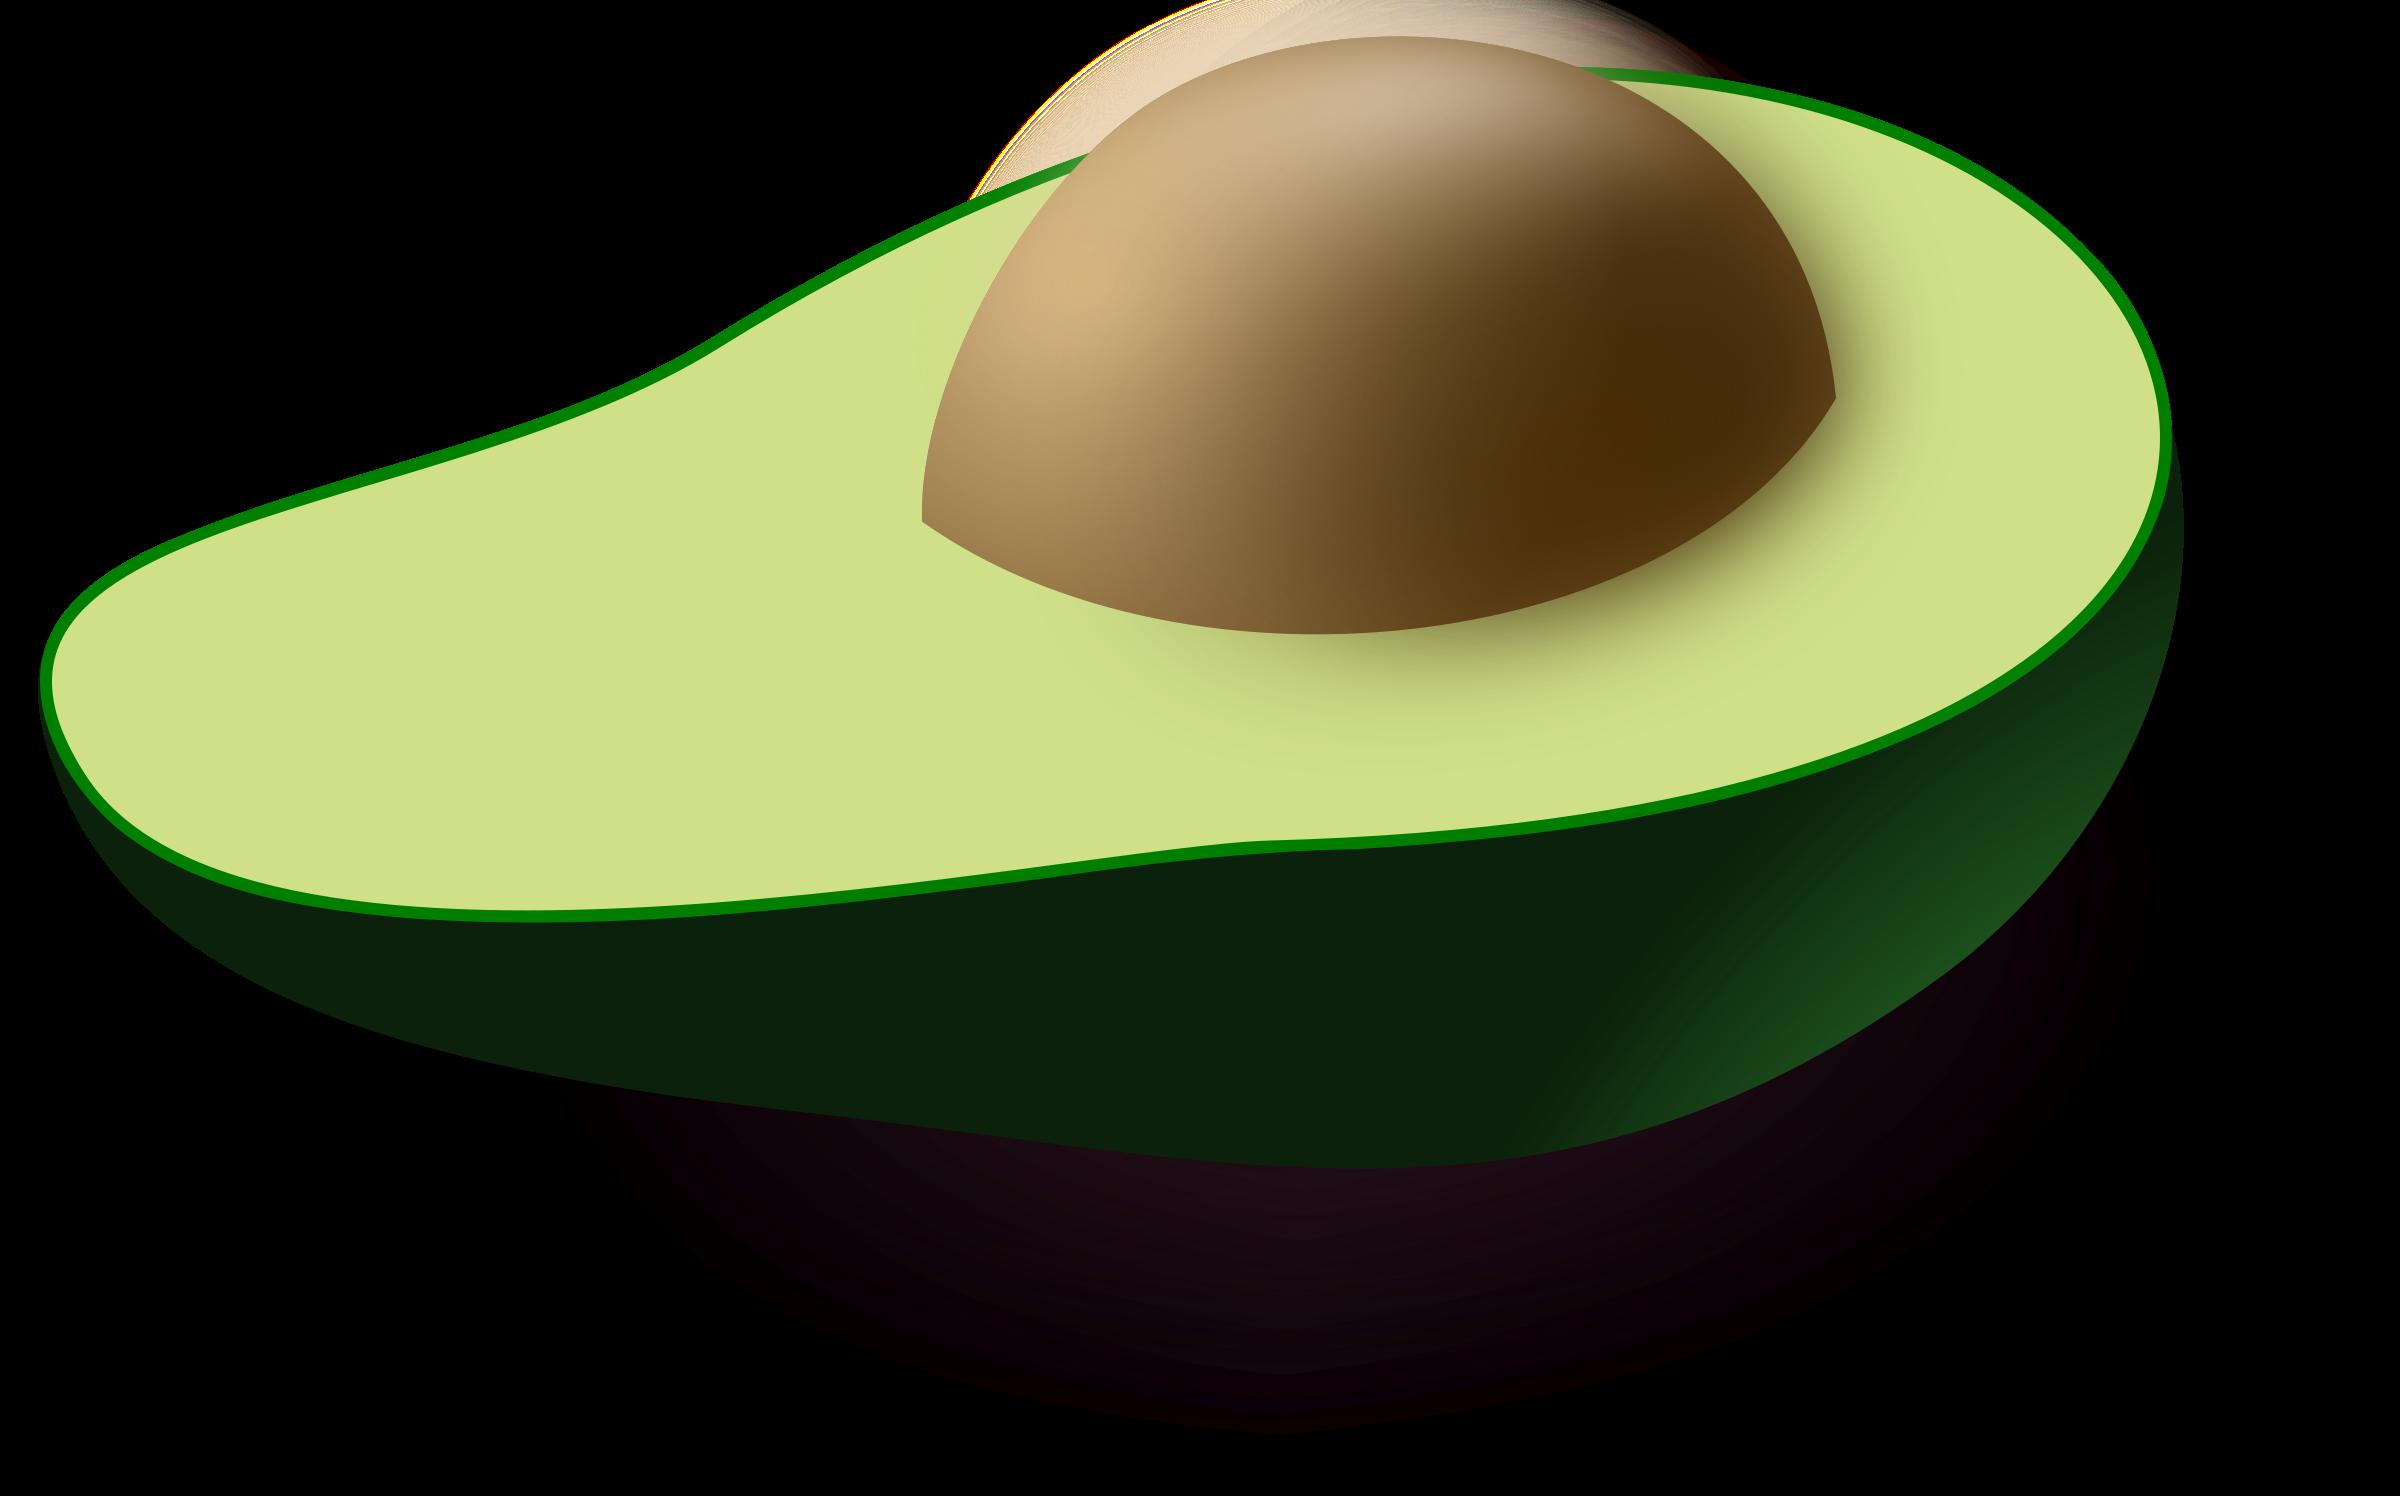 Avocado clipart cute Images Clipart Free Panda Clipart